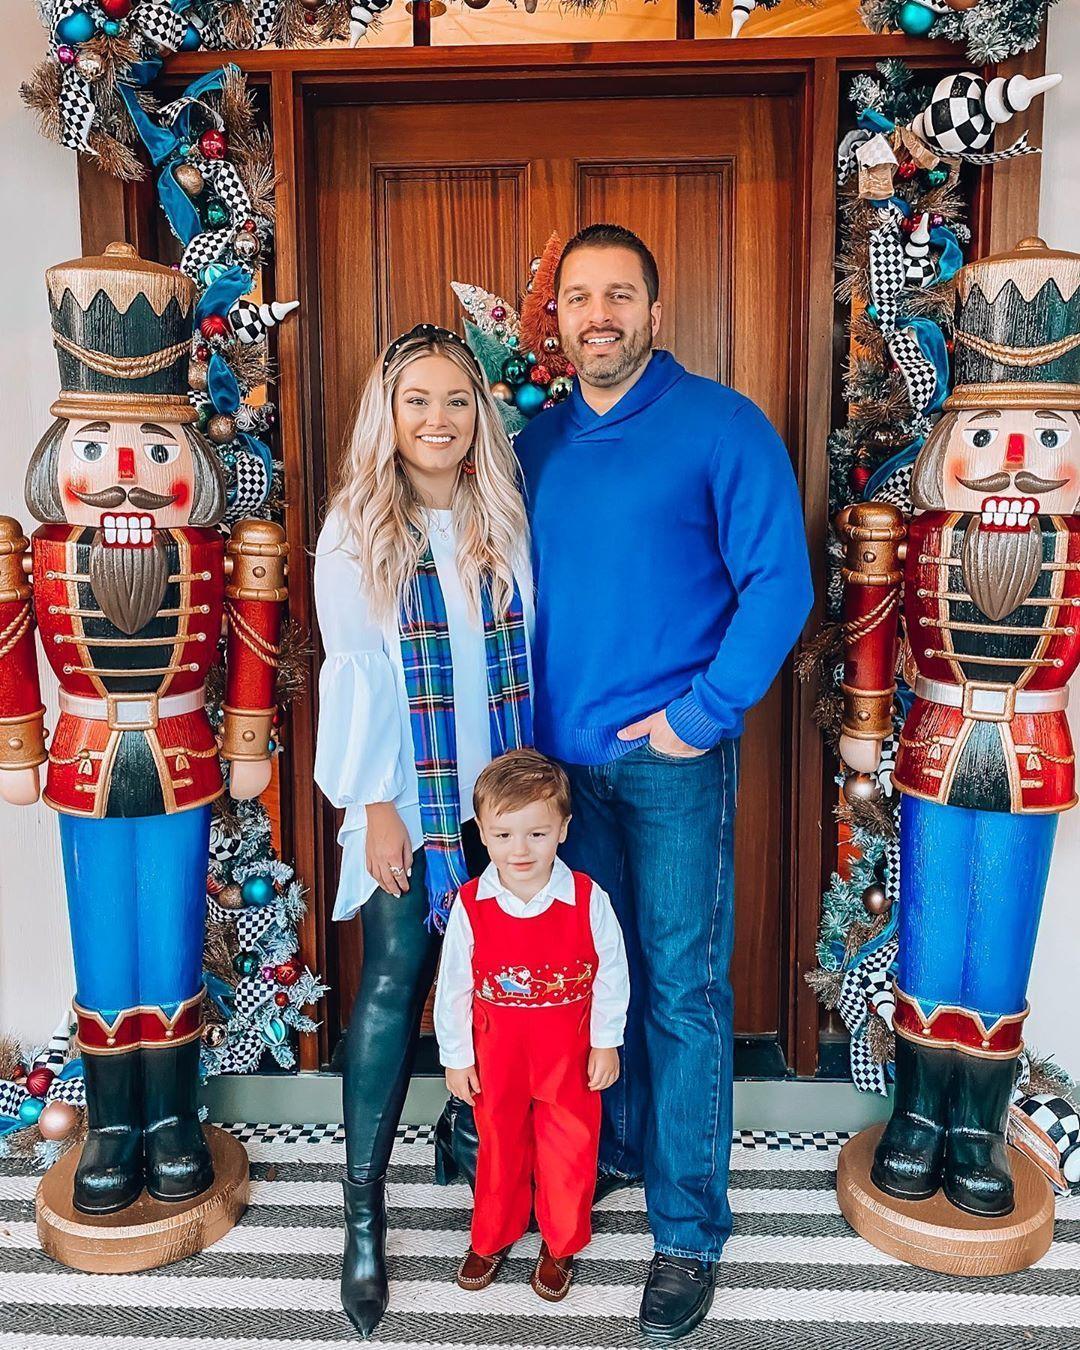 "Christmas Eve Church Services Near Me 2020 Whitney Rife Becker on Instagram: ""Christmas Eve Church Service"